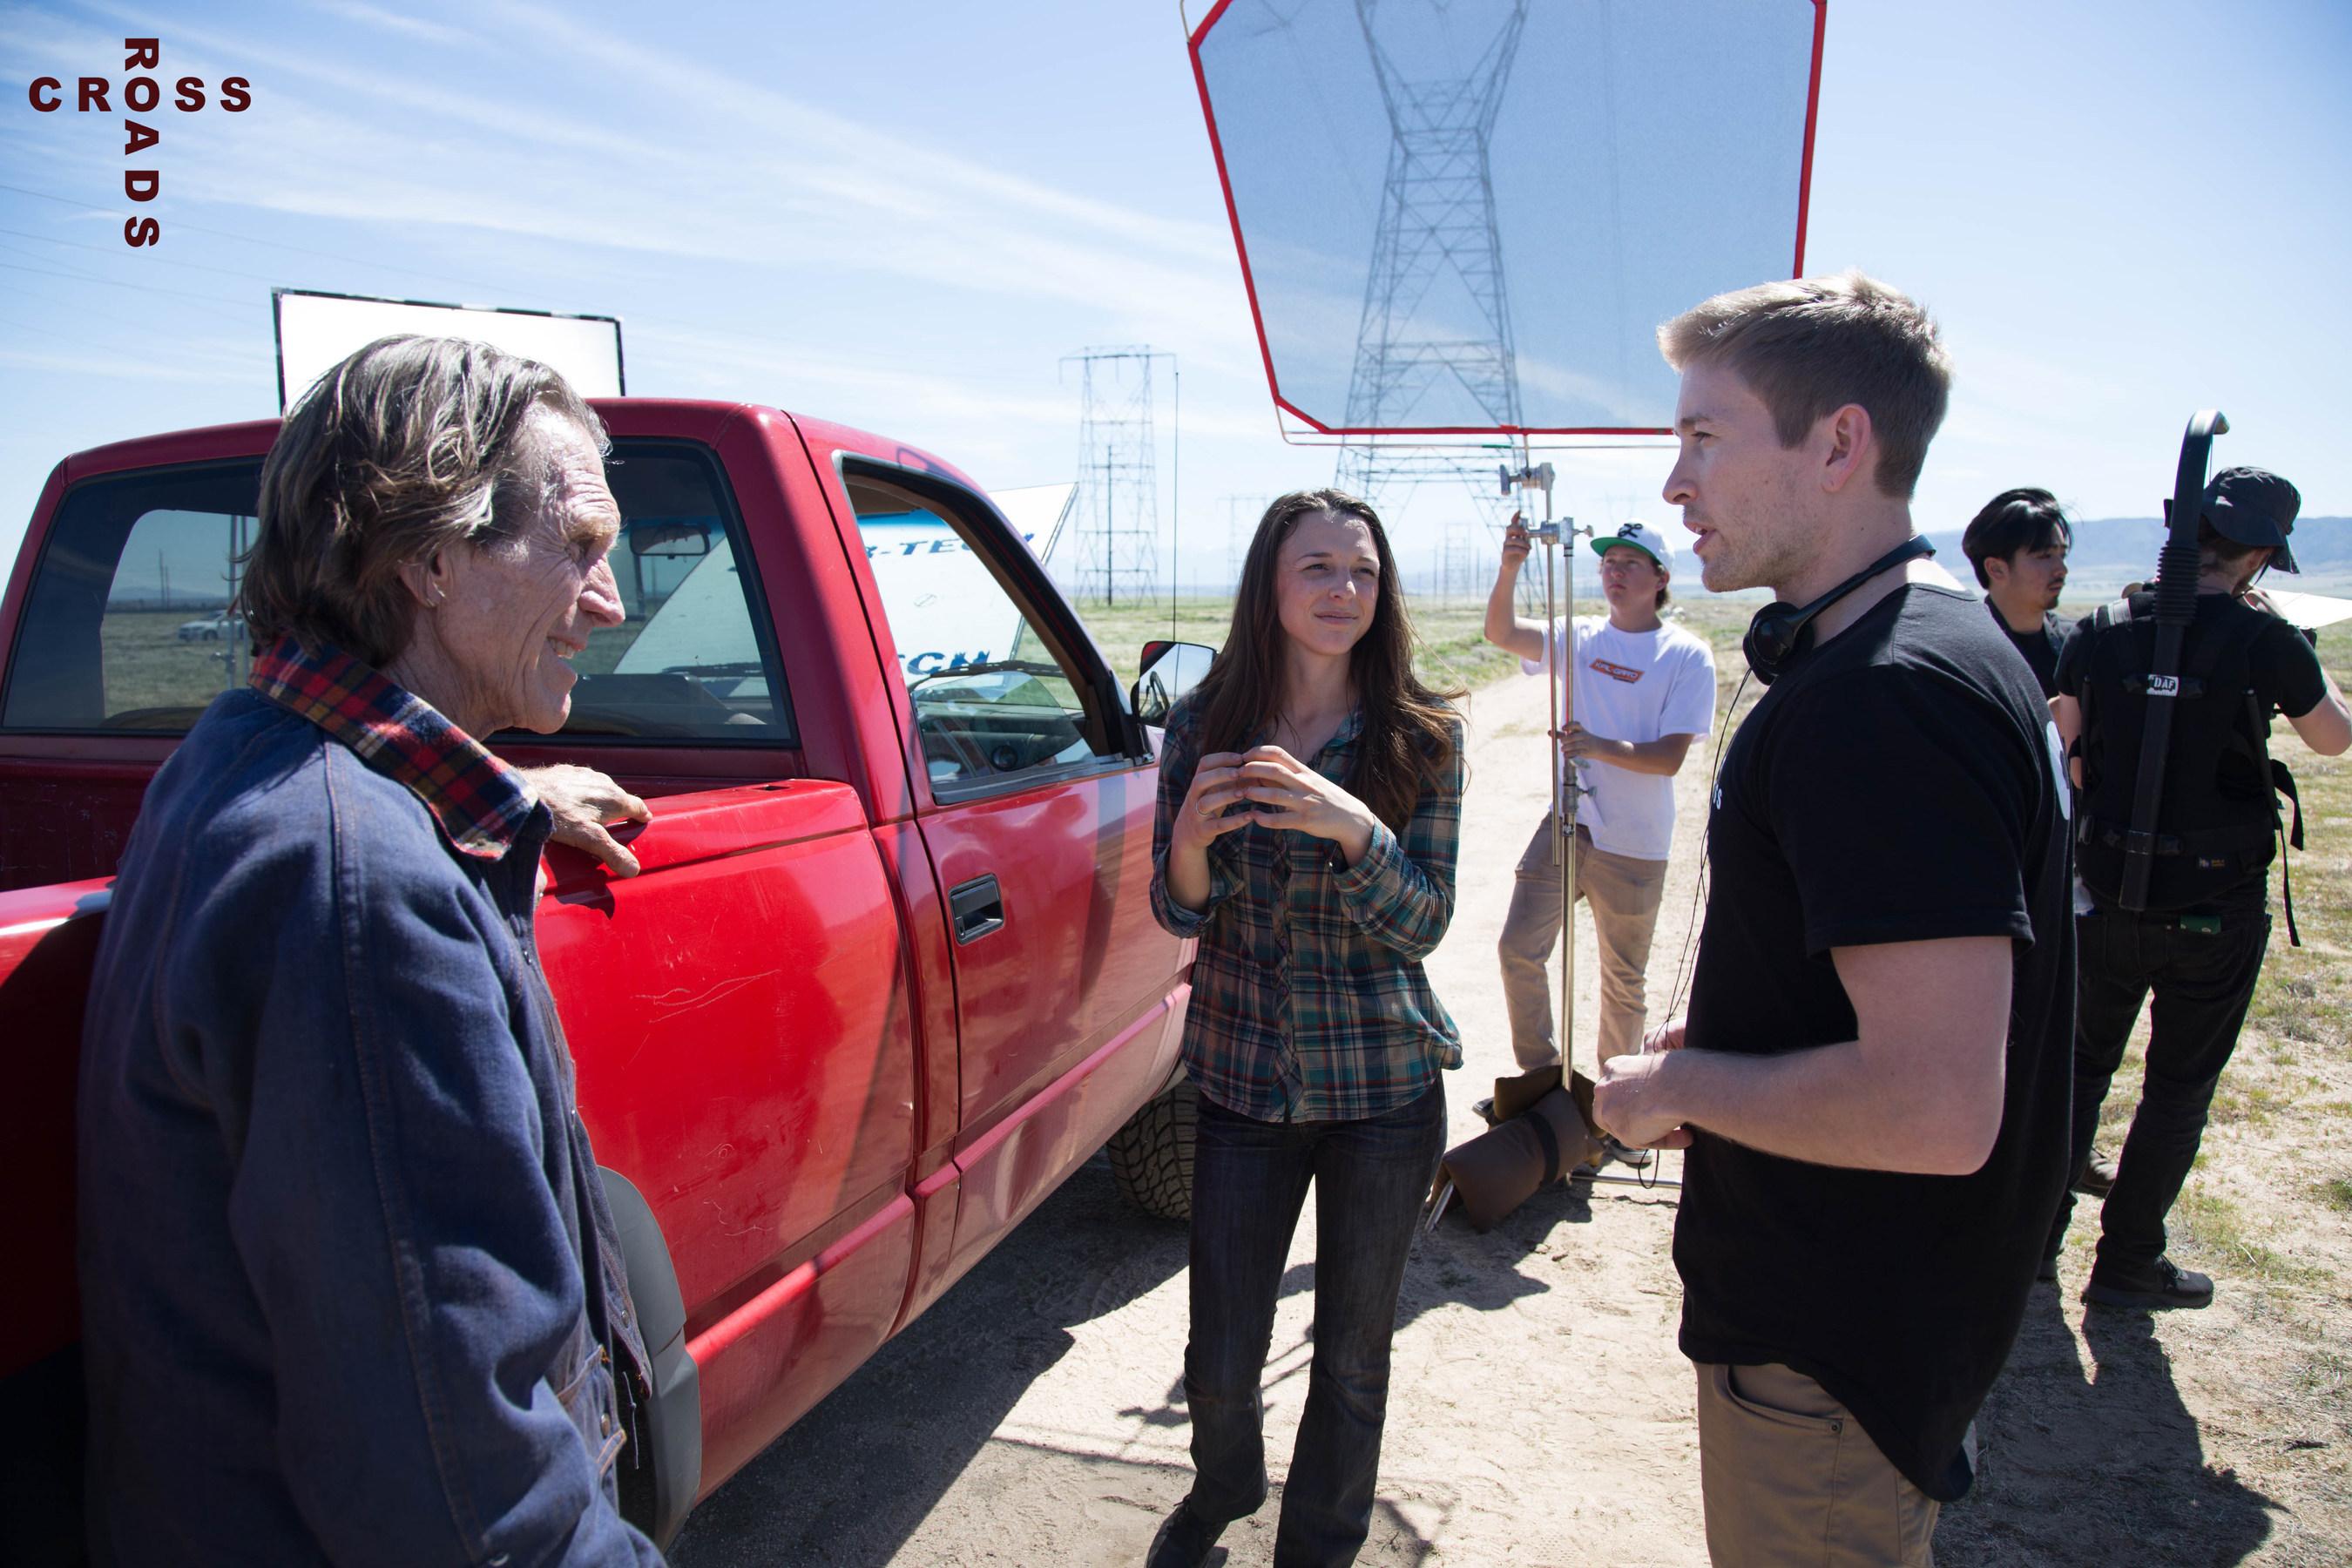 Award-Winning Film 'Crossroads' Debuts on Amazon Prime, Direct TV, and AT&T U-verse